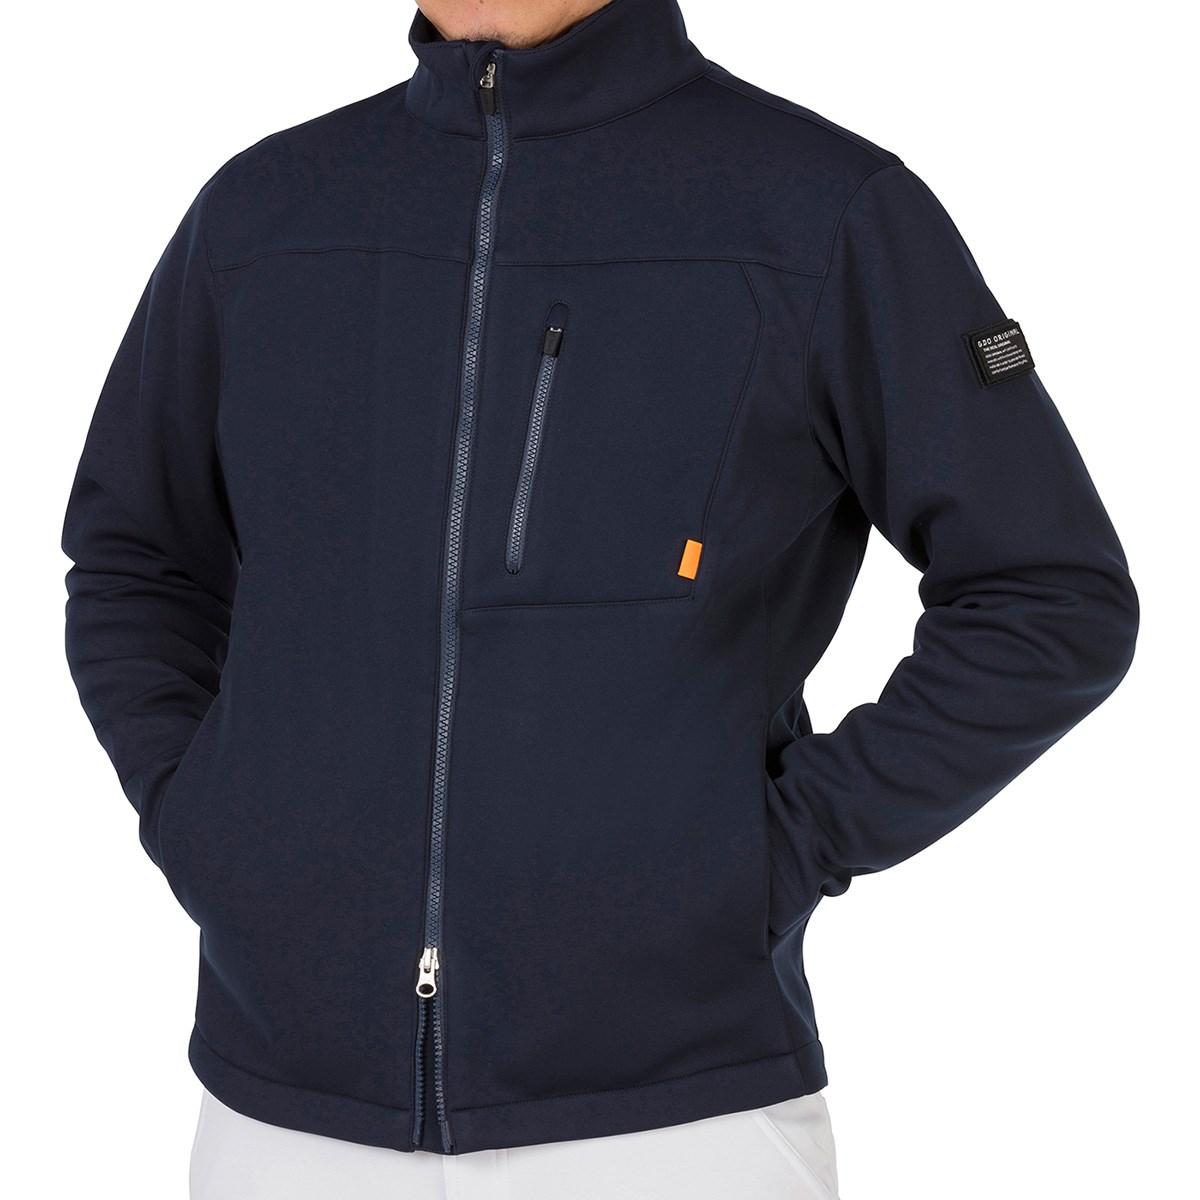 GDO オリジナル GDO ORIGINAL 裏フリースボンディングジャケット XL ネイビー